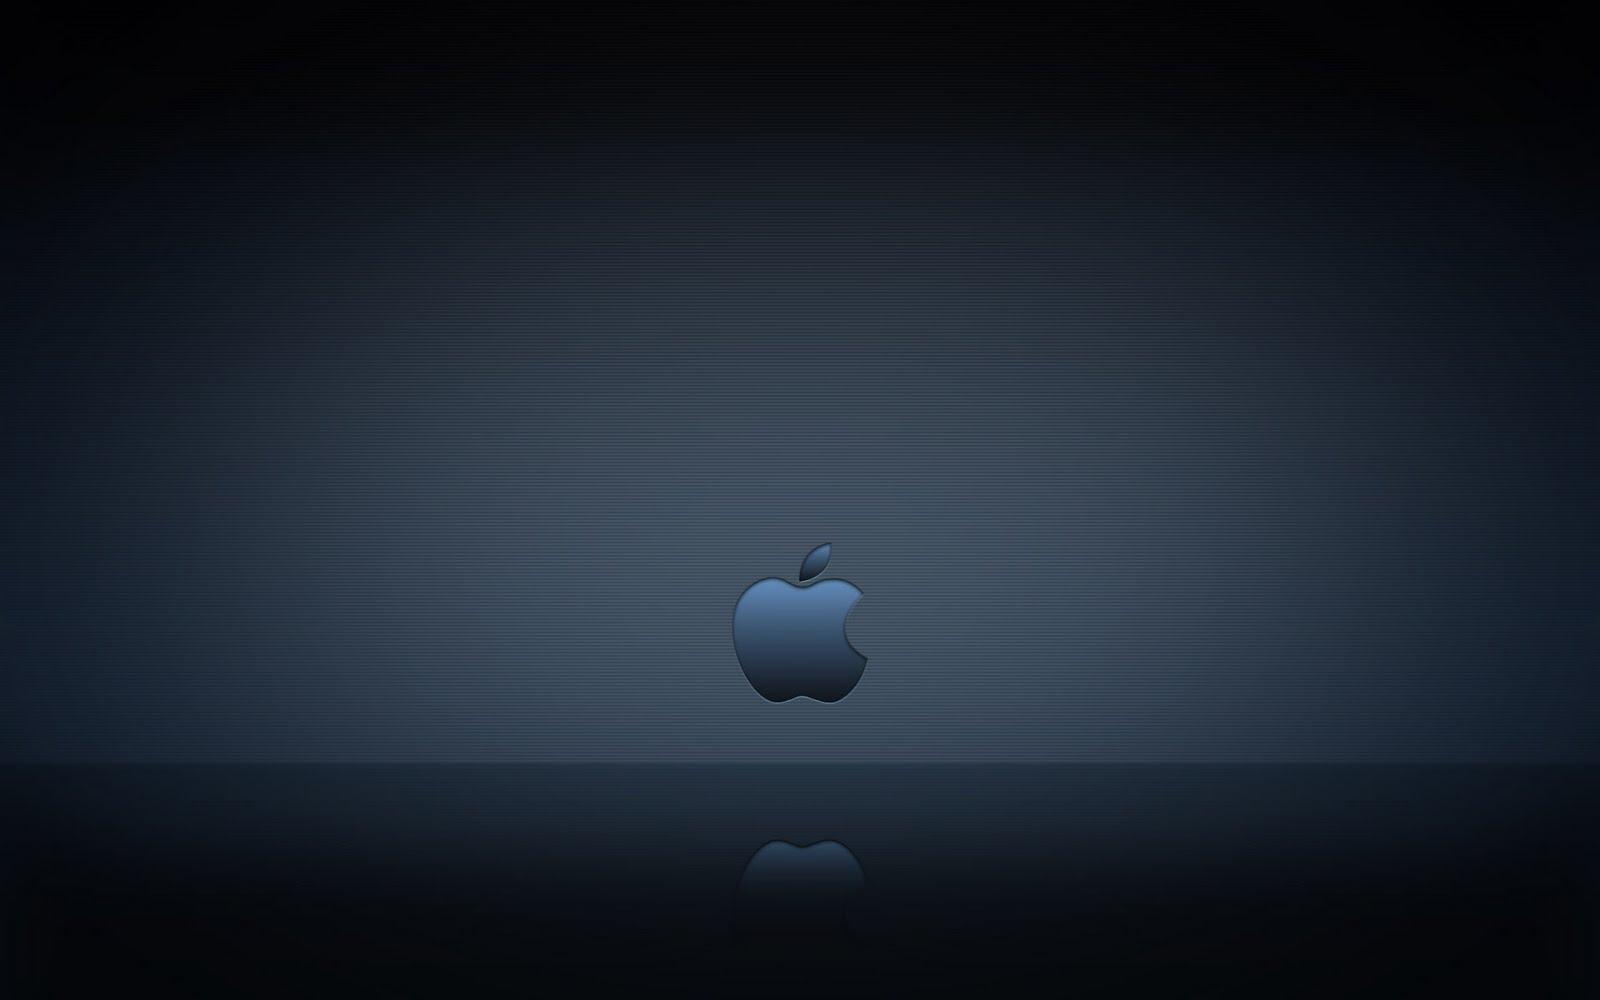 desktop wallpapers: Apple Mac Wallpapers, HD Apple, iPhone,  desktop wallpap...